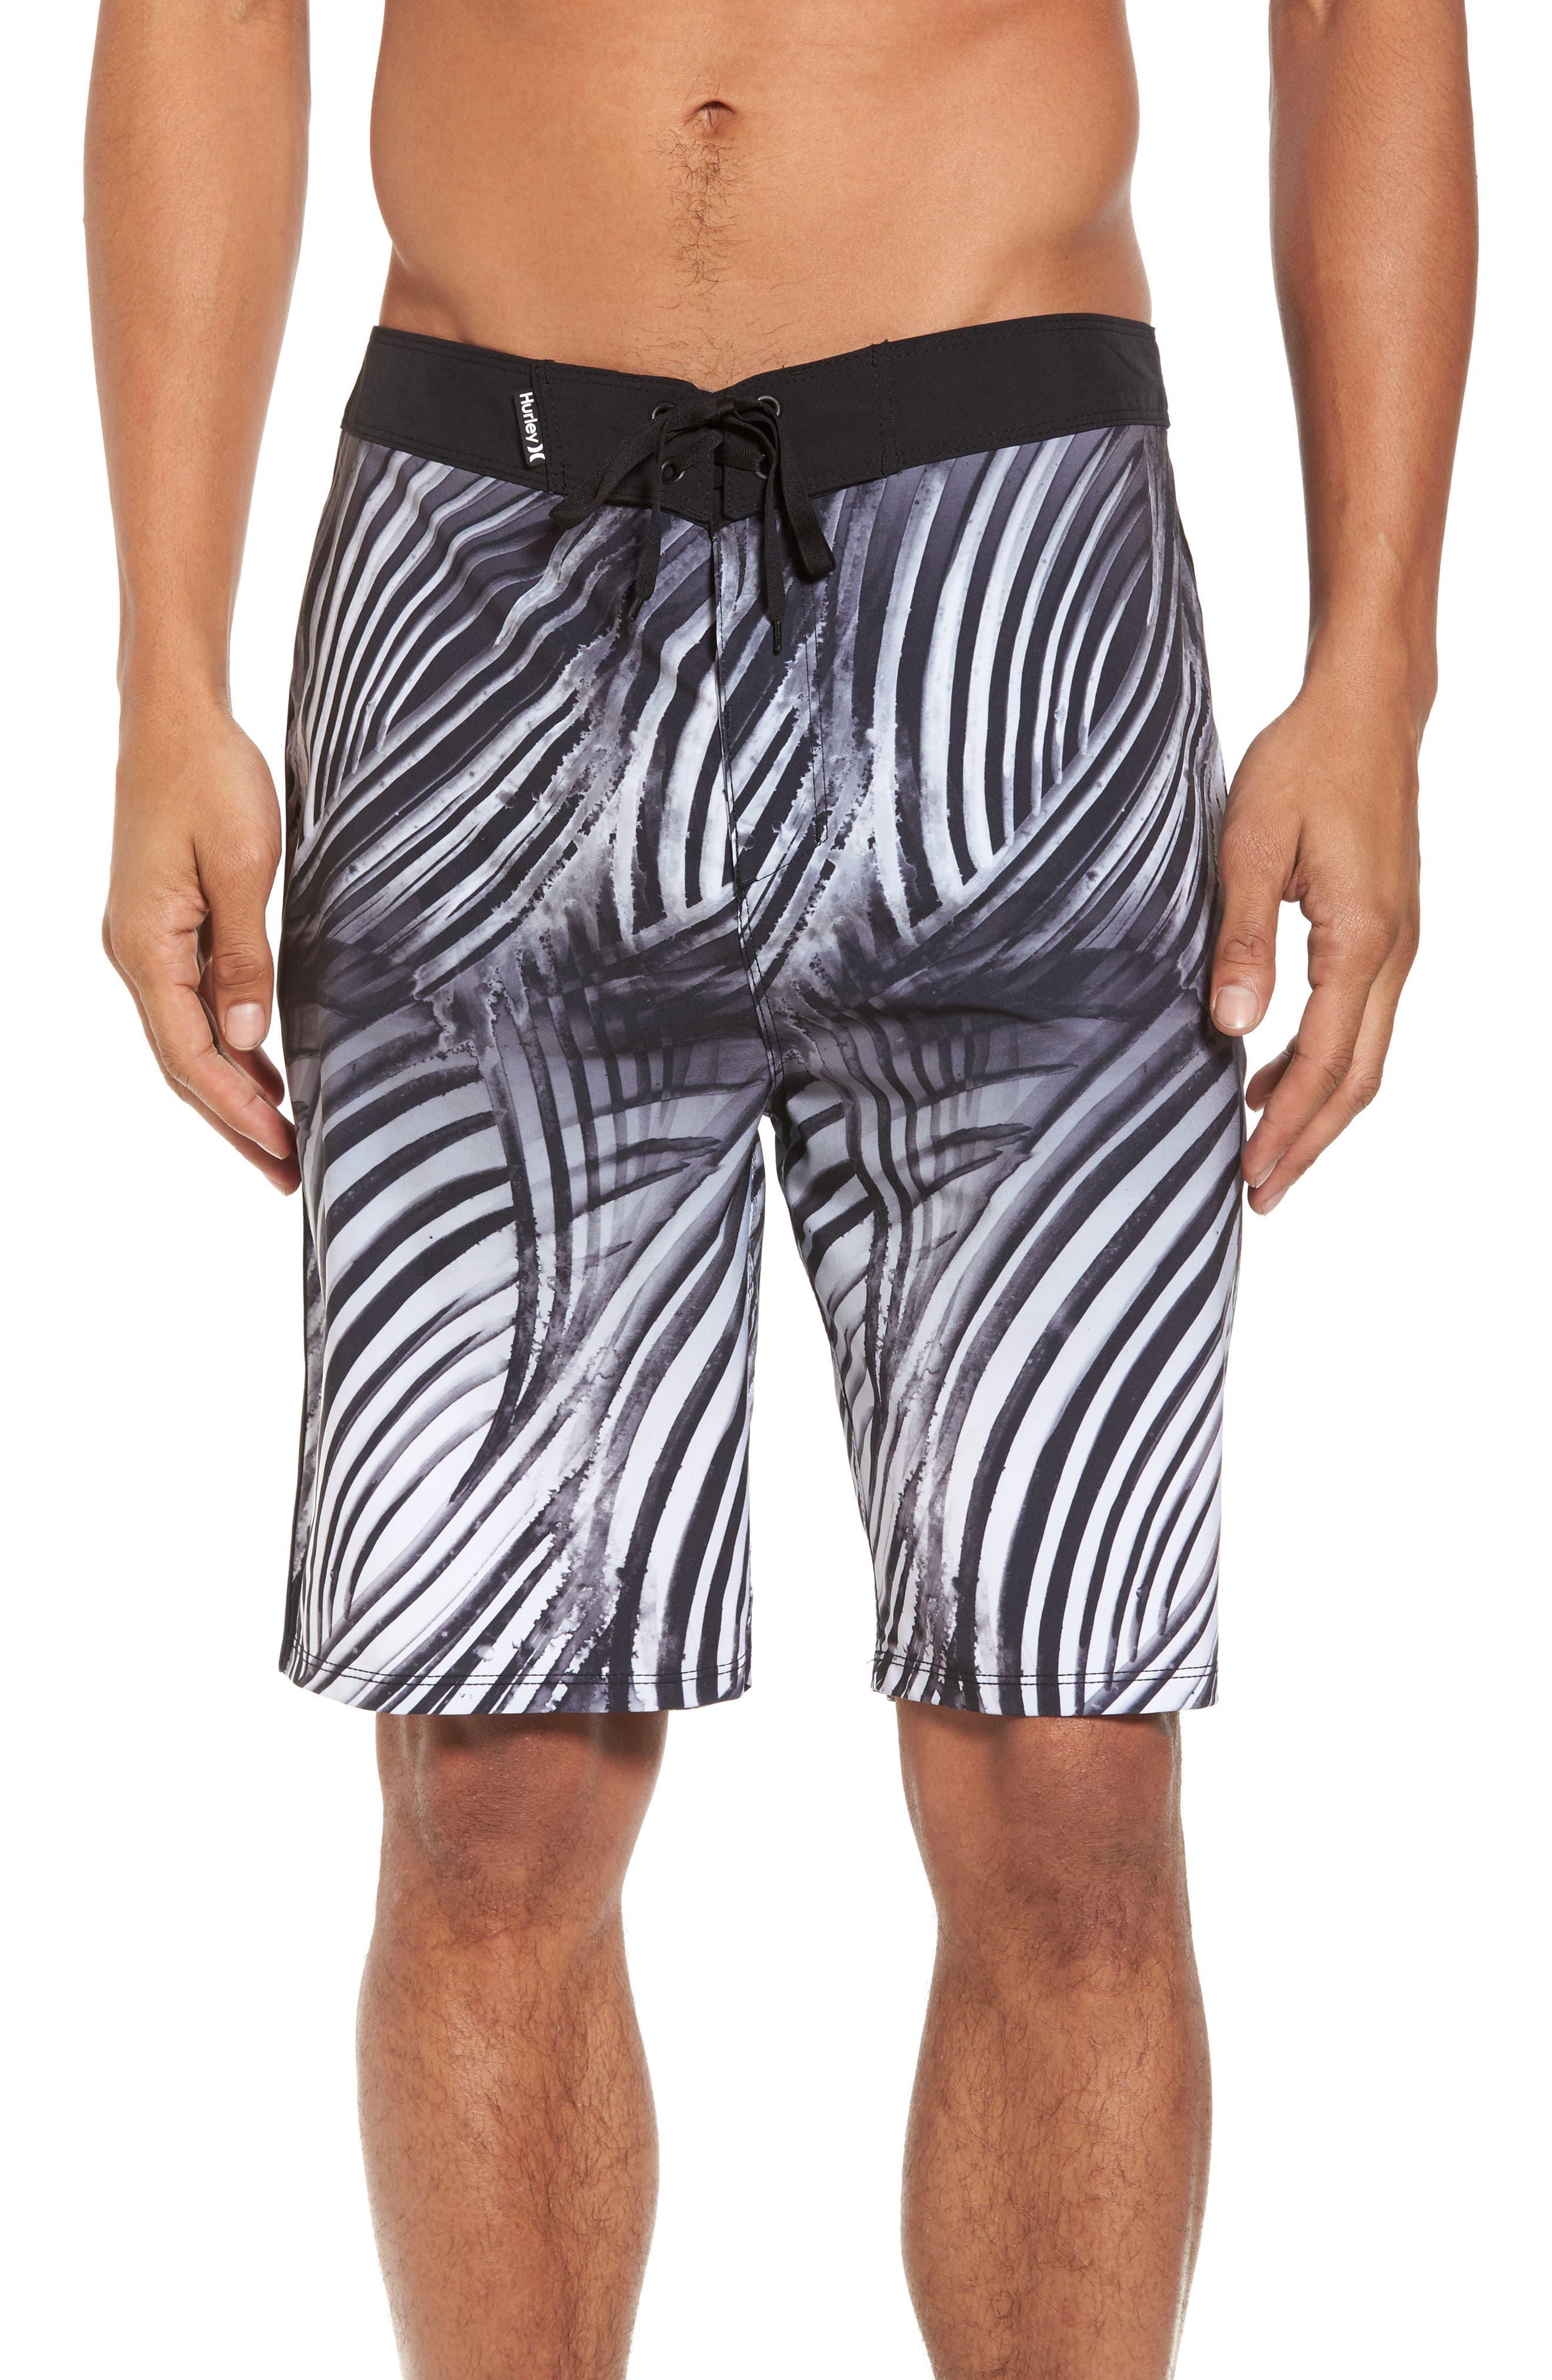 Phantom Crest Board Shorts,                         Main,                         color, 010